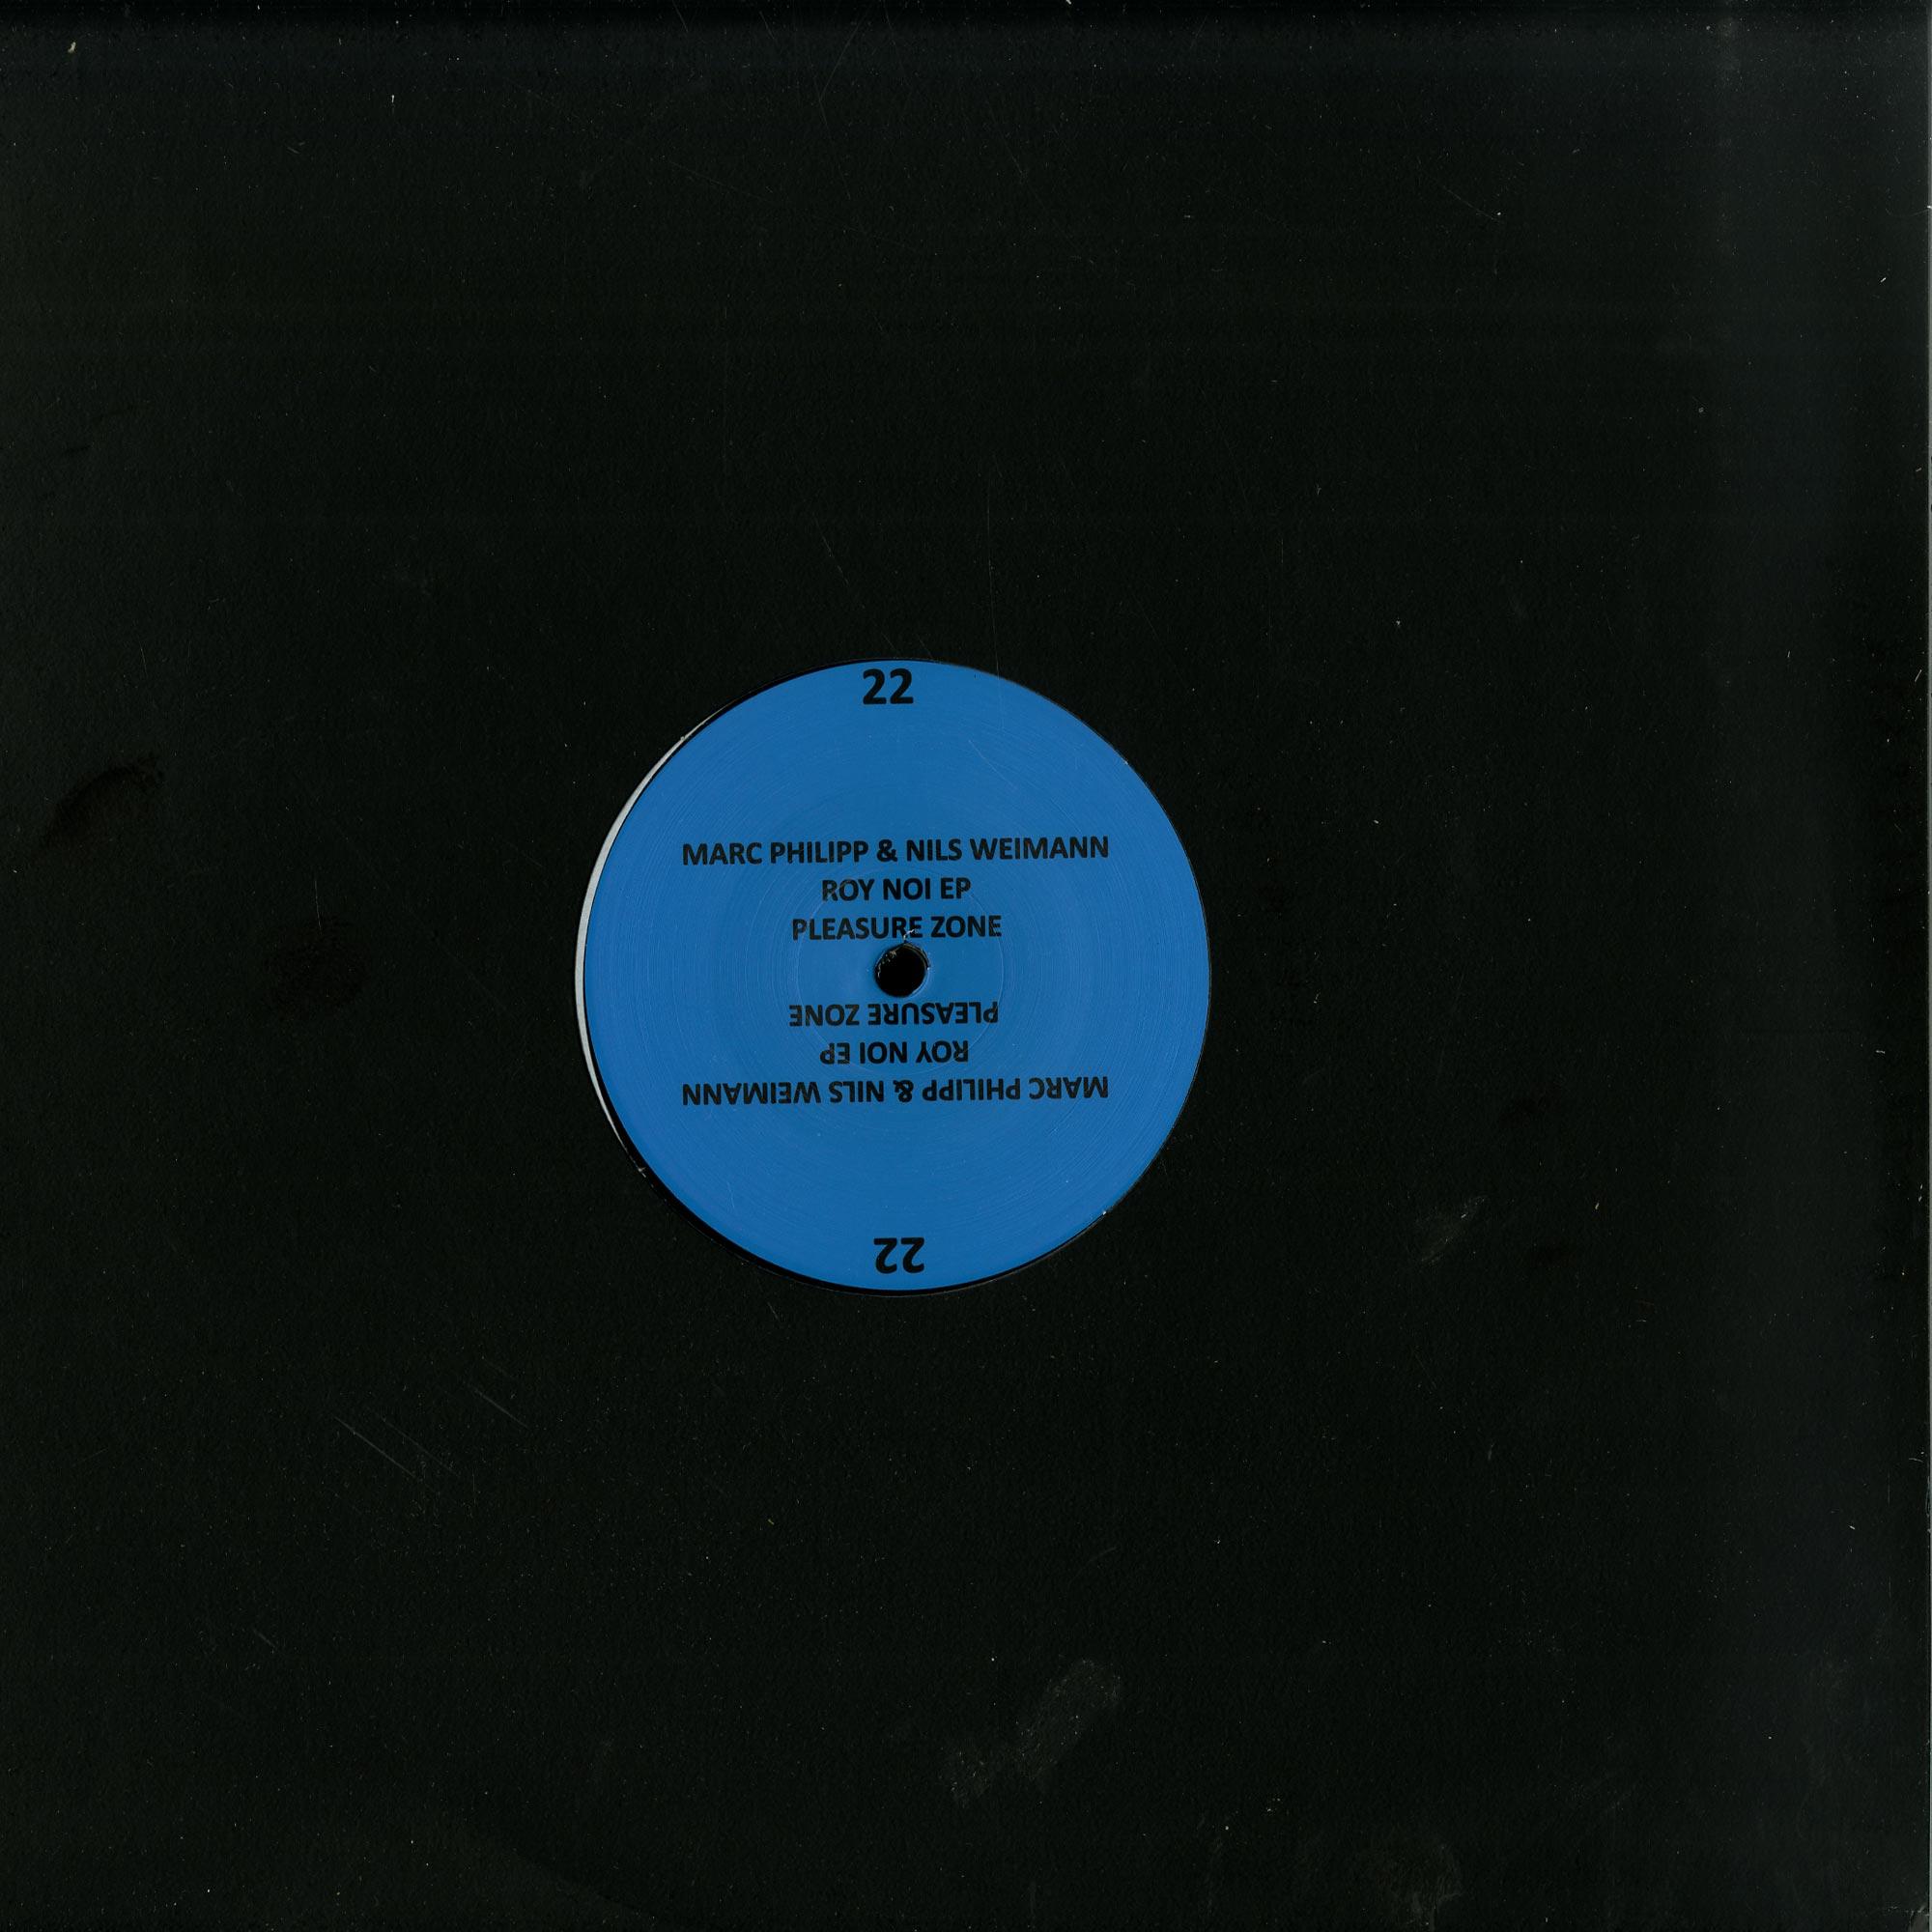 Marc Philipp & Nils Weimann - Roy Noi EP